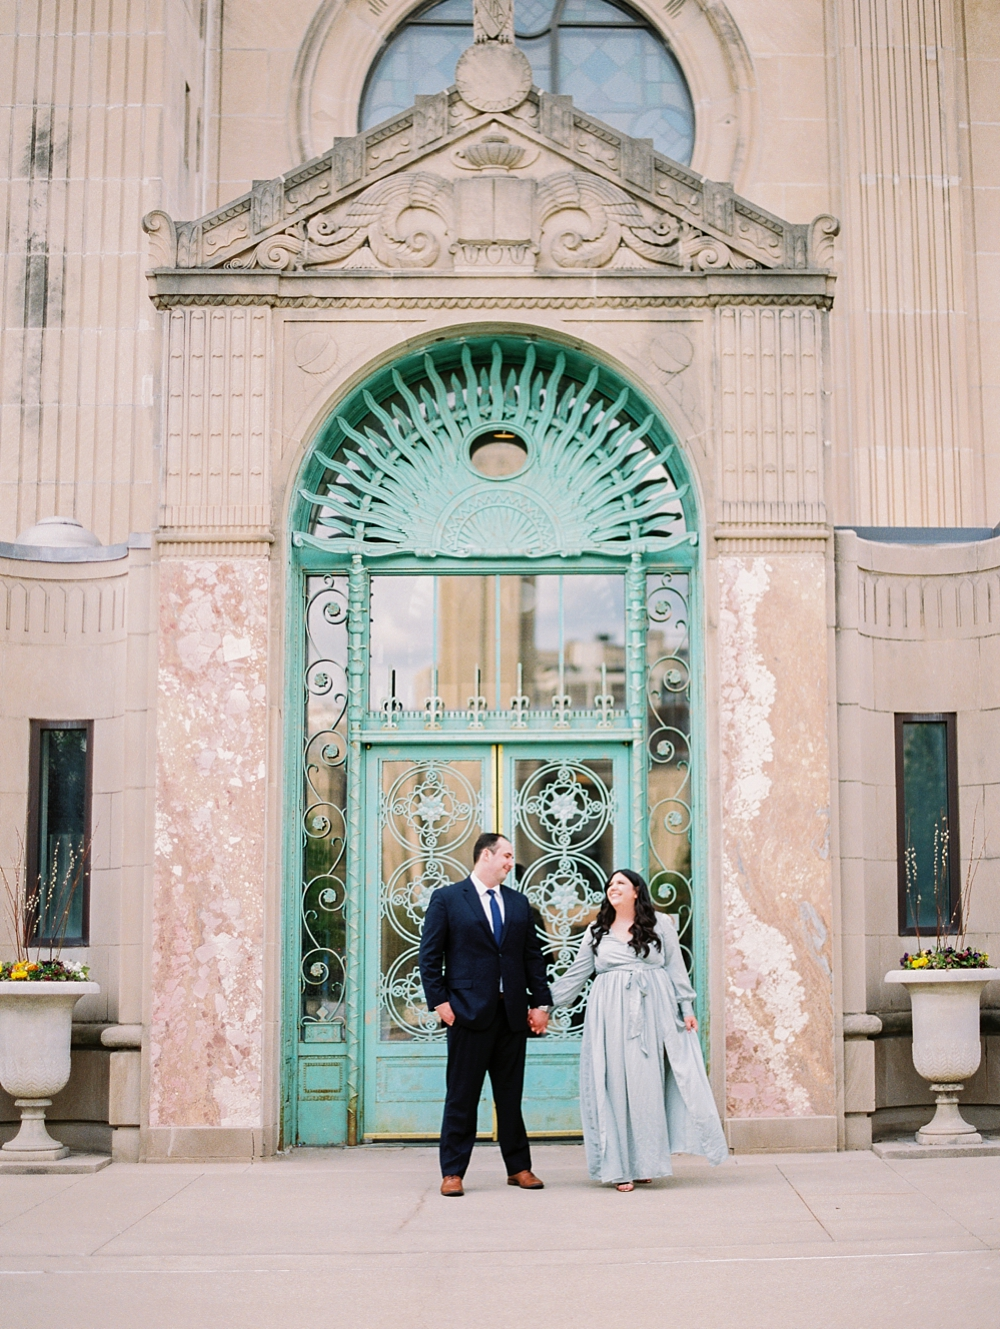 kristin-la-voie-photography-chicago-wedding-photographer-loyola-engagement-25